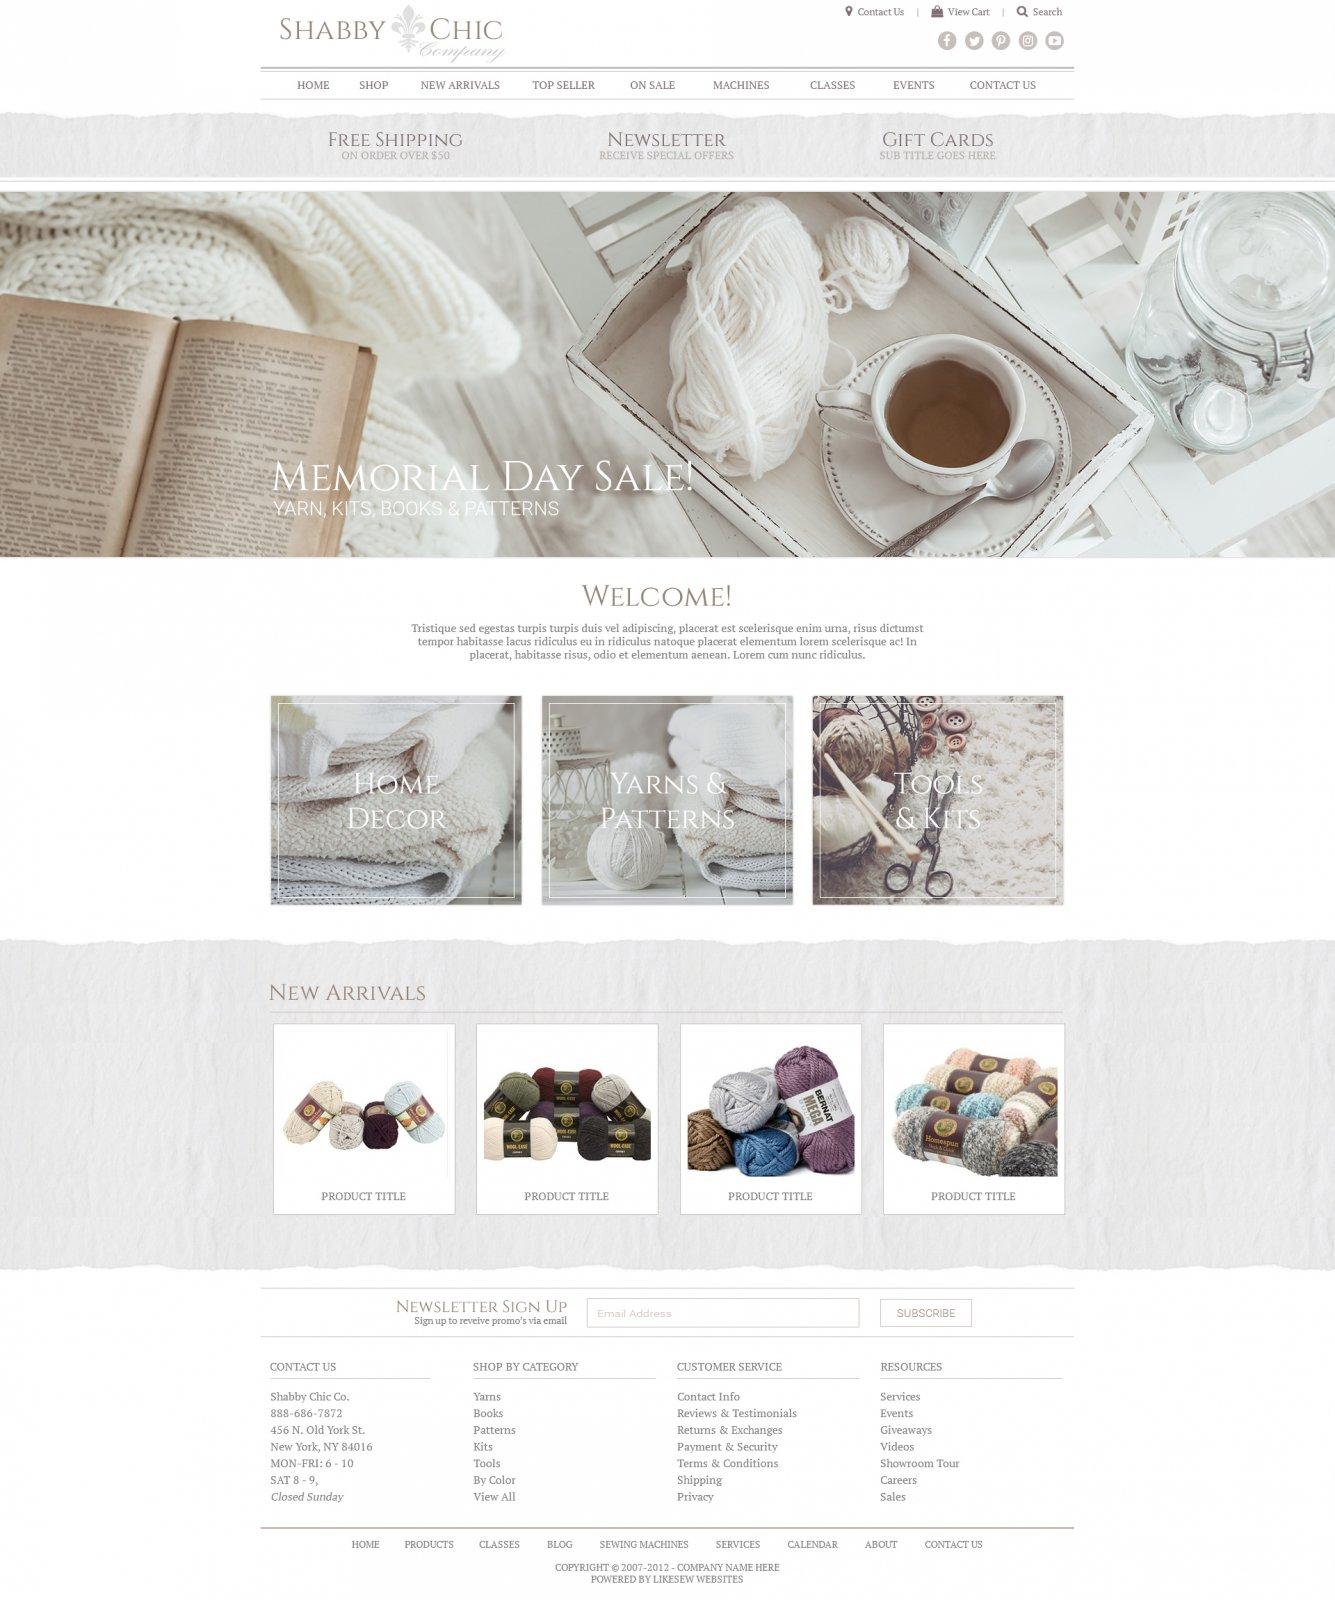 responsive template designs. Black Bedroom Furniture Sets. Home Design Ideas